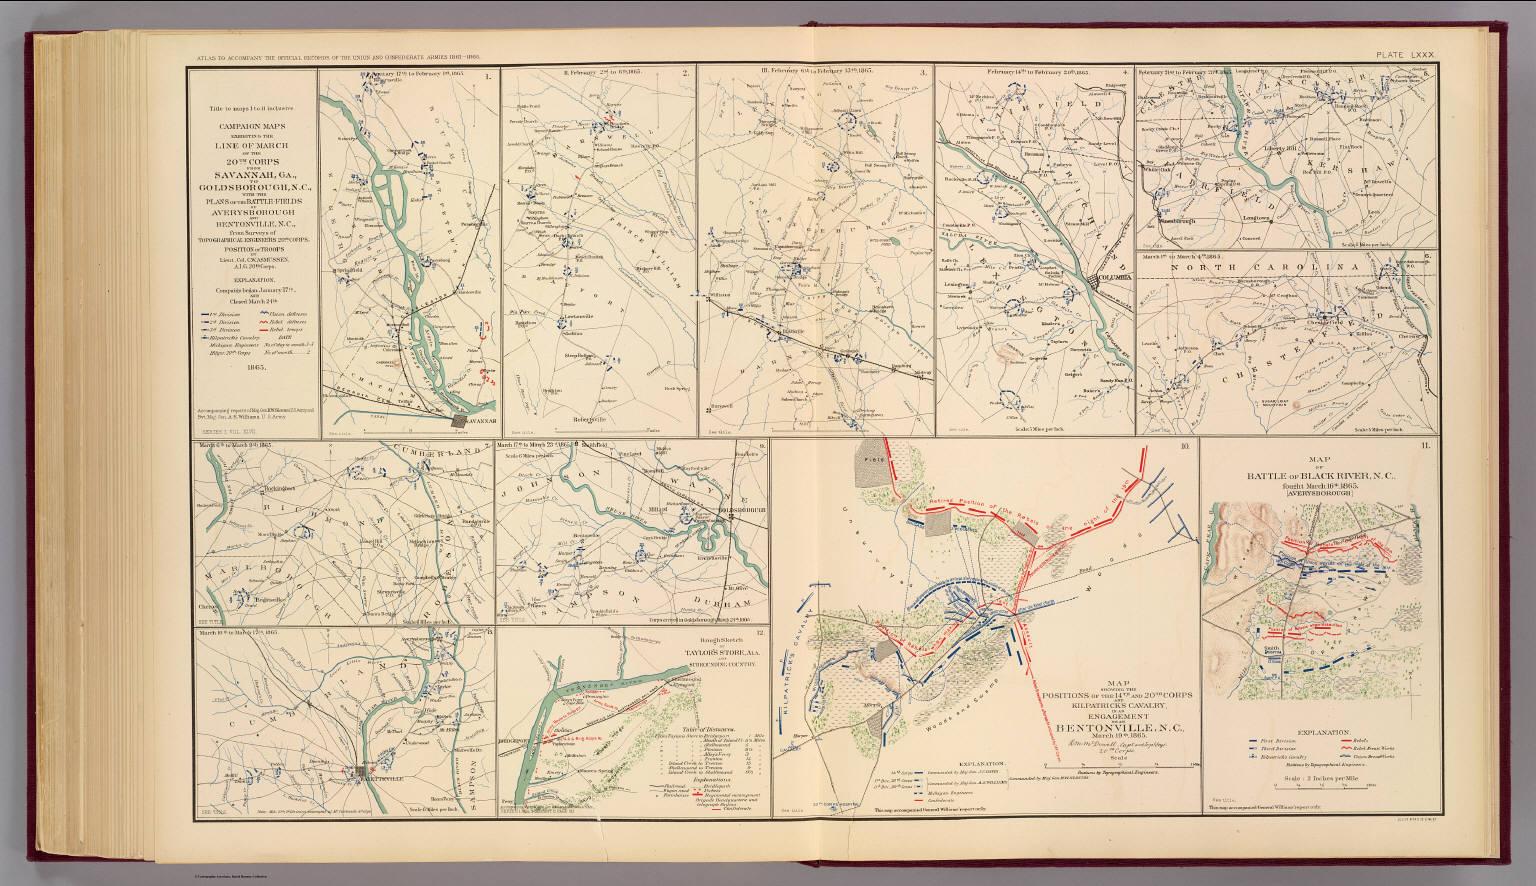 SavannahGoldsborough campaign maps David Rumsey Historical Map